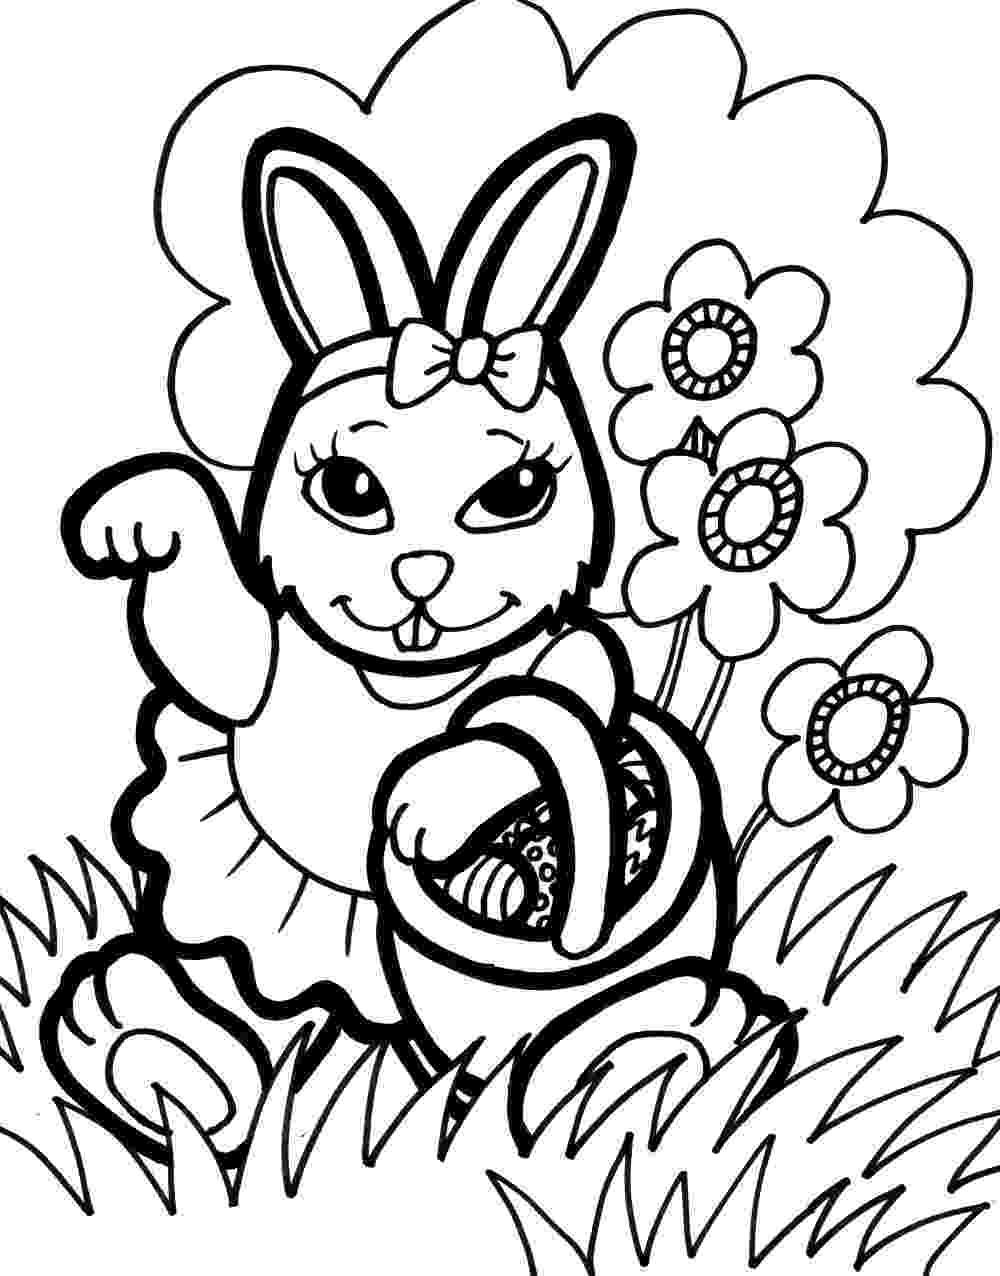 printable coloring rabbit free printable rabbit coloring pages for kids rabbit coloring printable 1 1